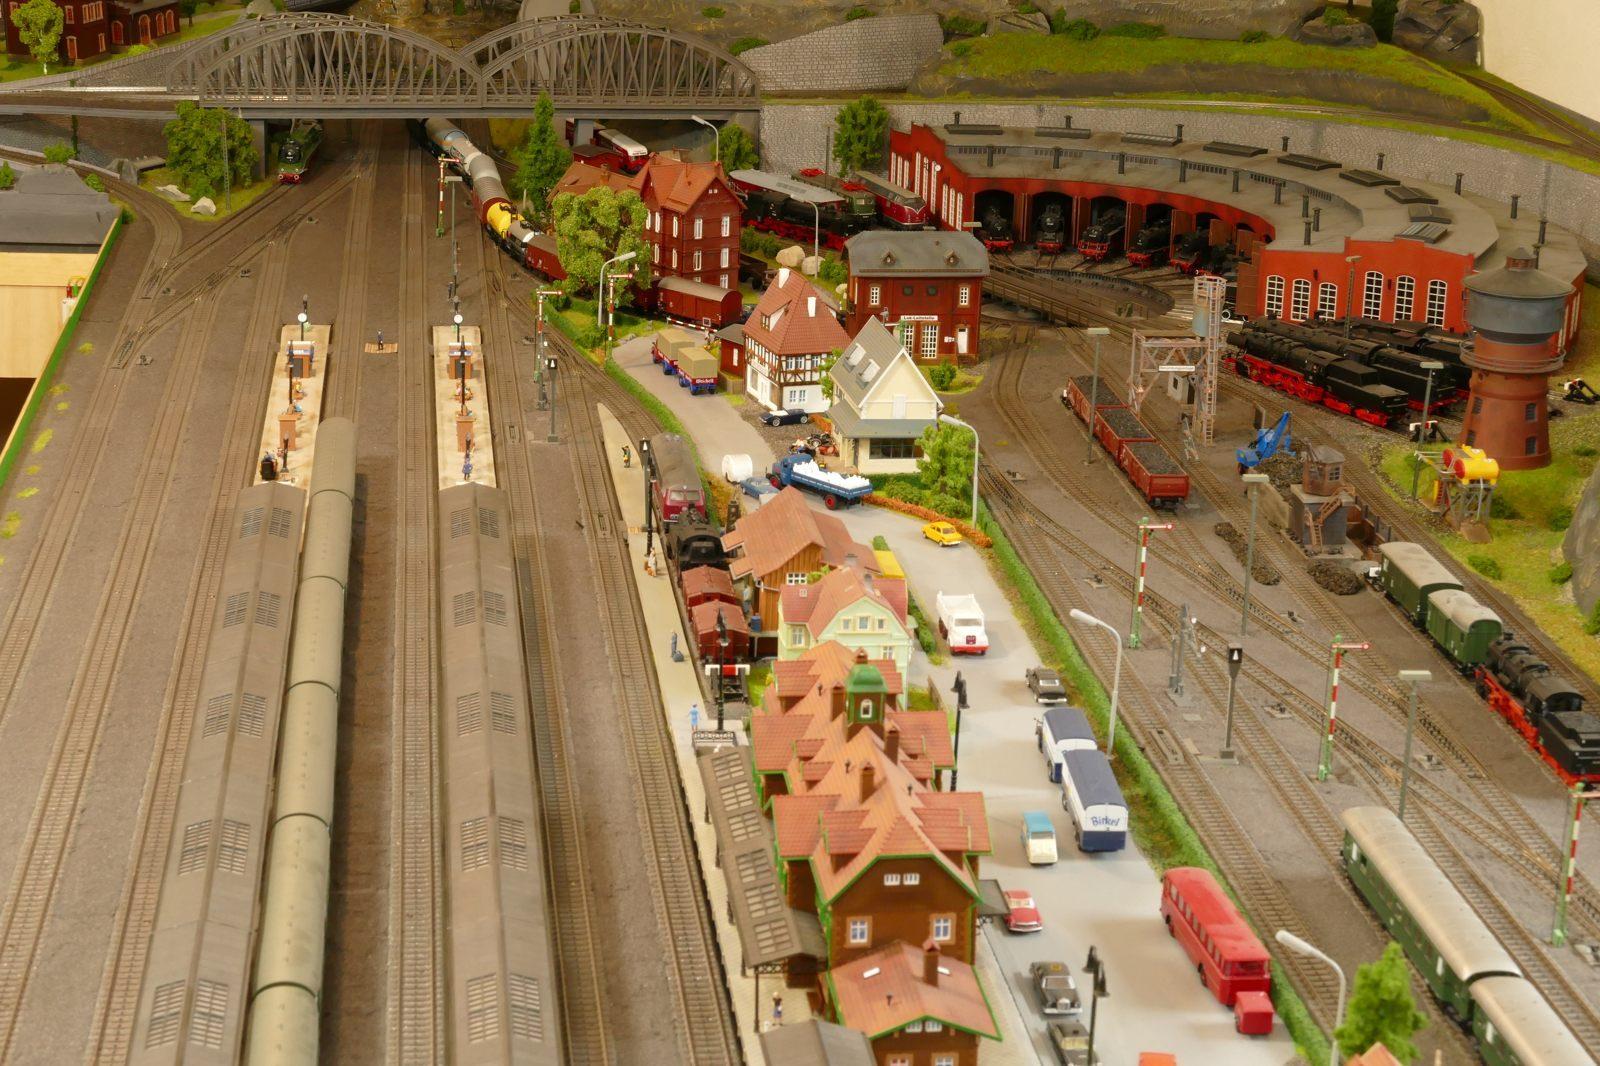 Hbf: Bahnanlagen